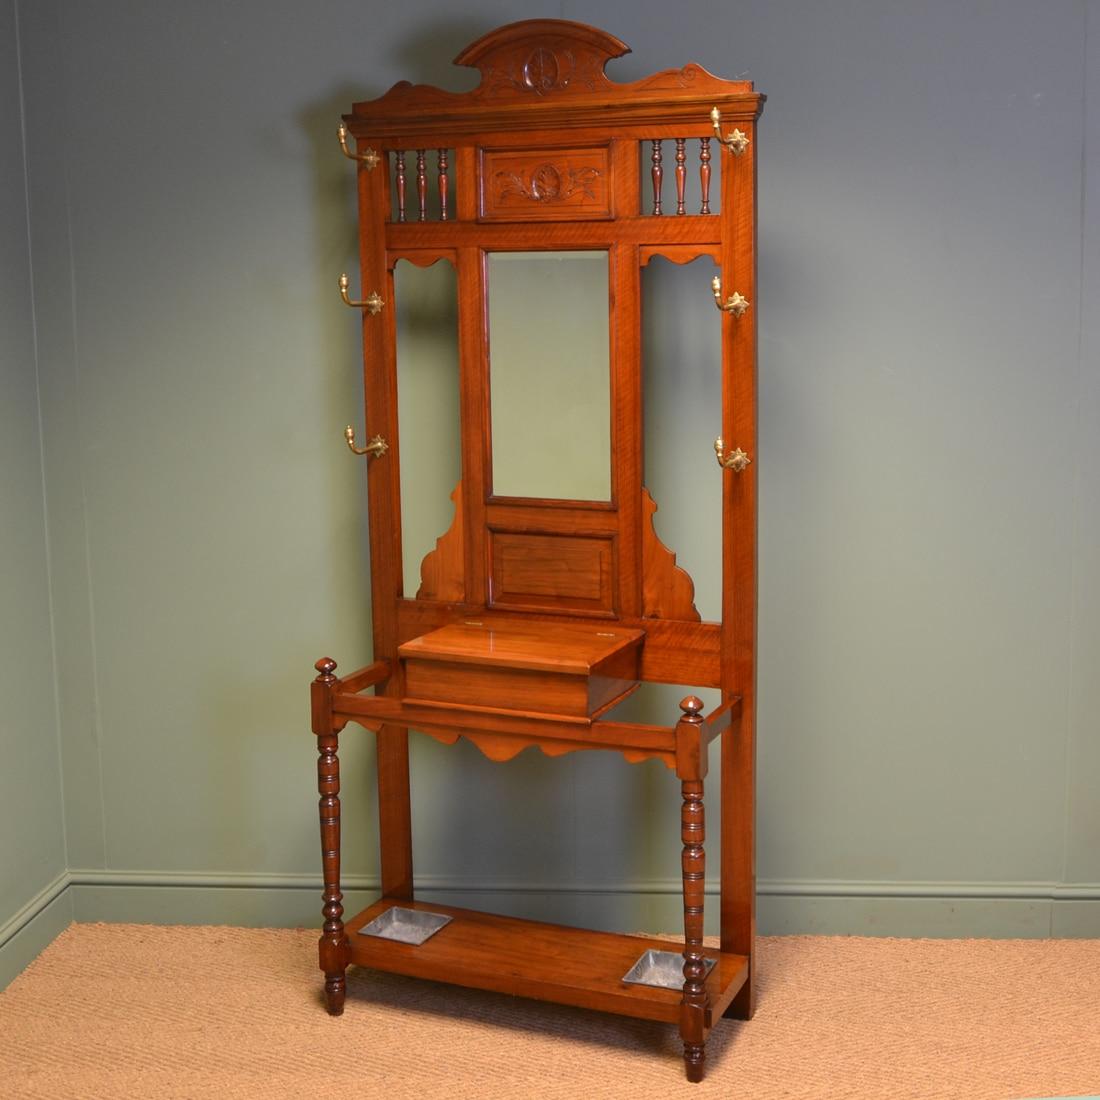 High Quality Victorian Arts & Crafts Walnut Antique Hall Stand